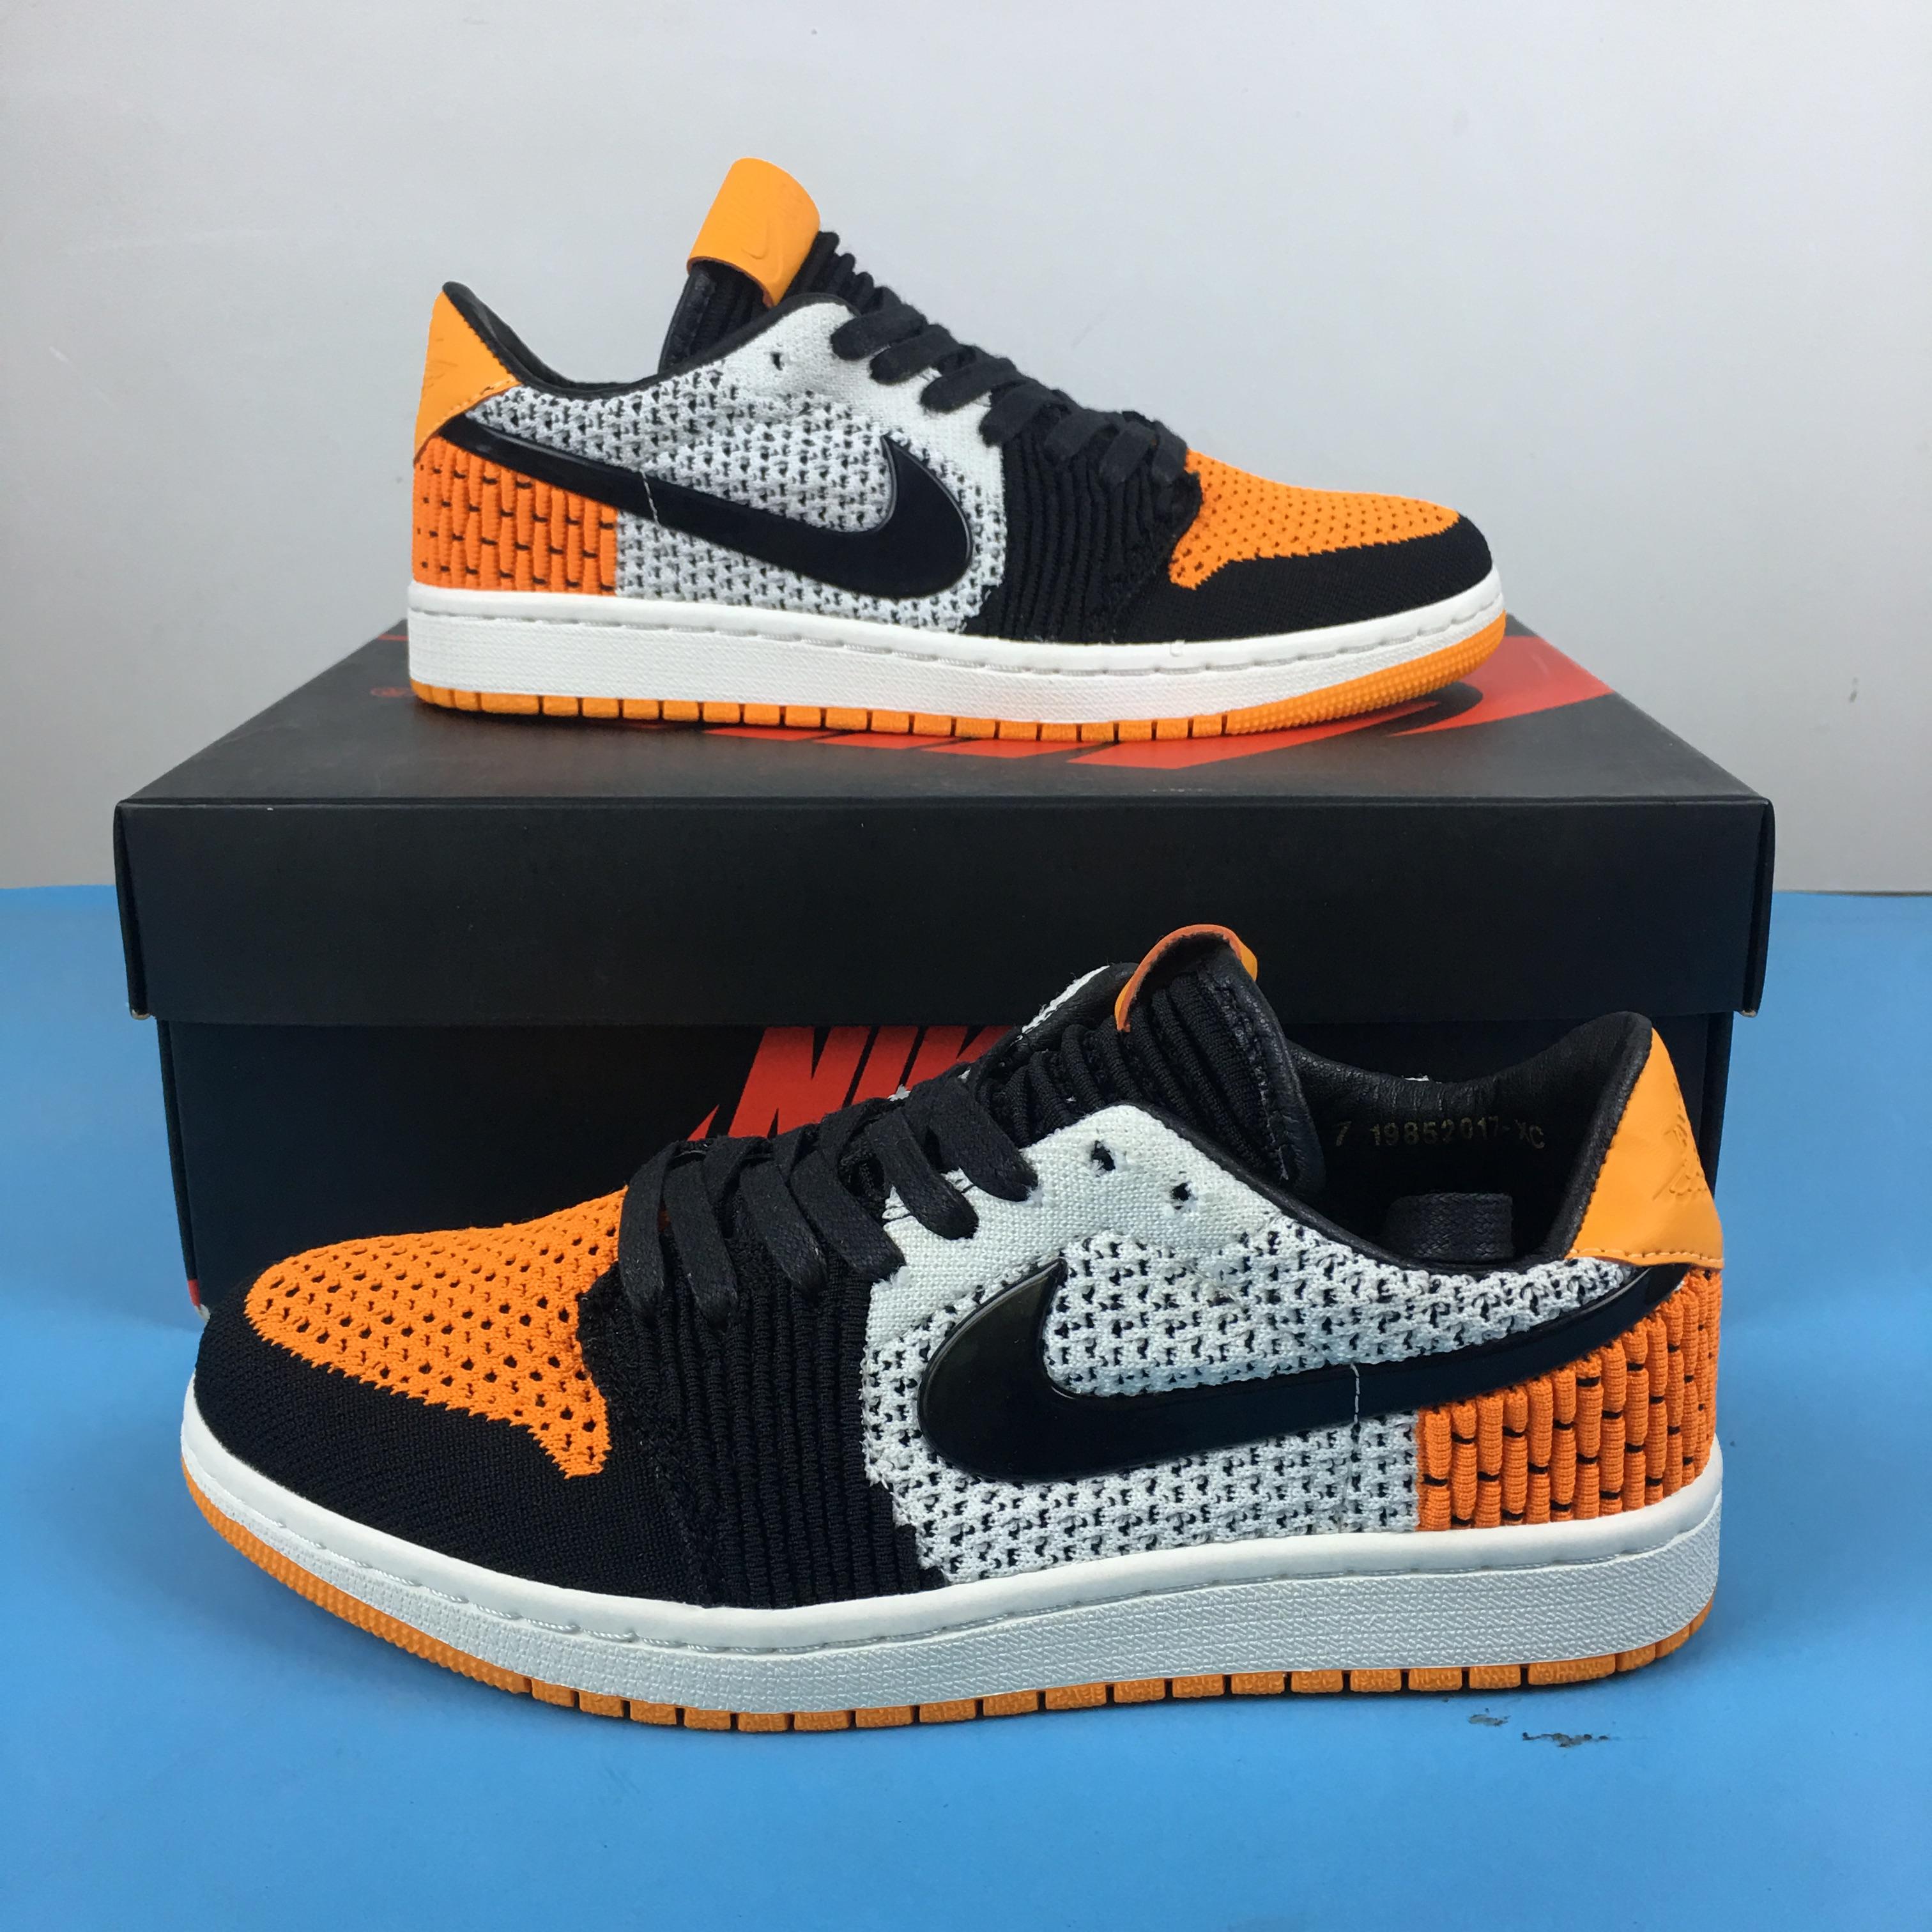 2018 Men Air Jordan 1 Low Flyknit Orange Black White Shoes